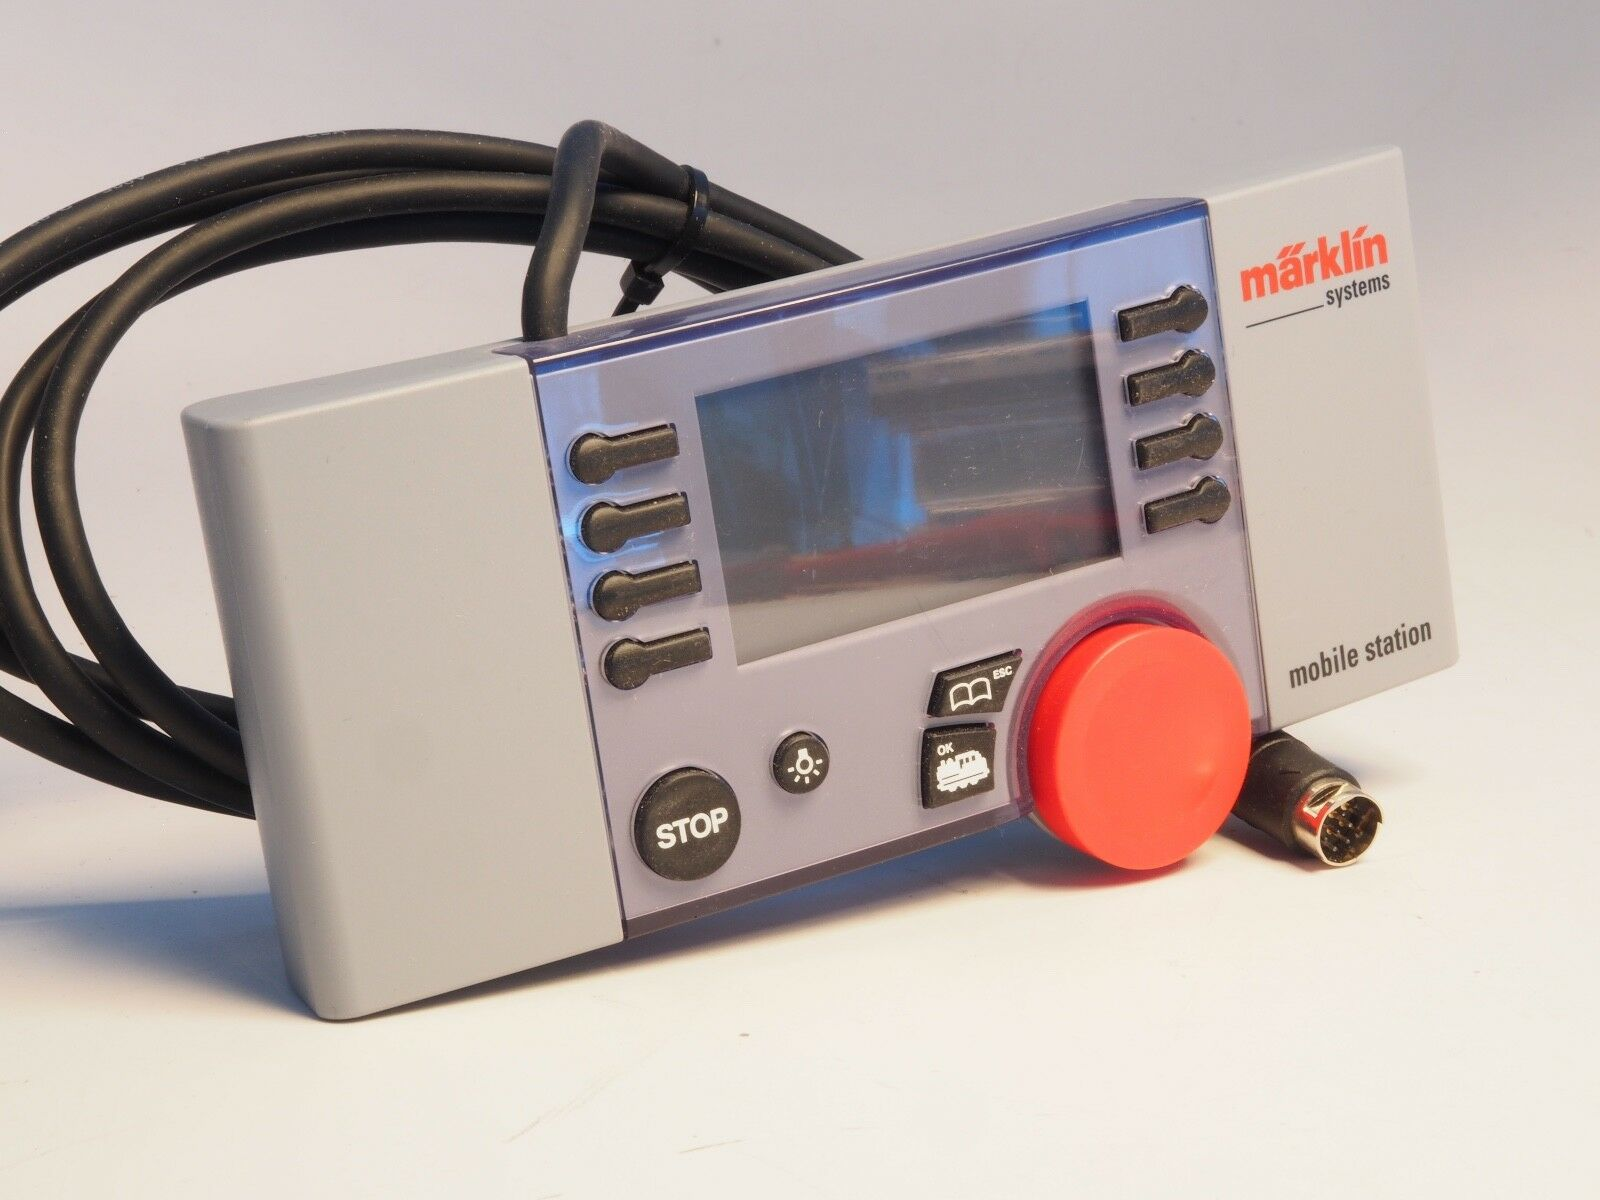 Controlador de estación Mobil 60651 Marklin Digital Medidor de versión 1.9 amp escala 1 me